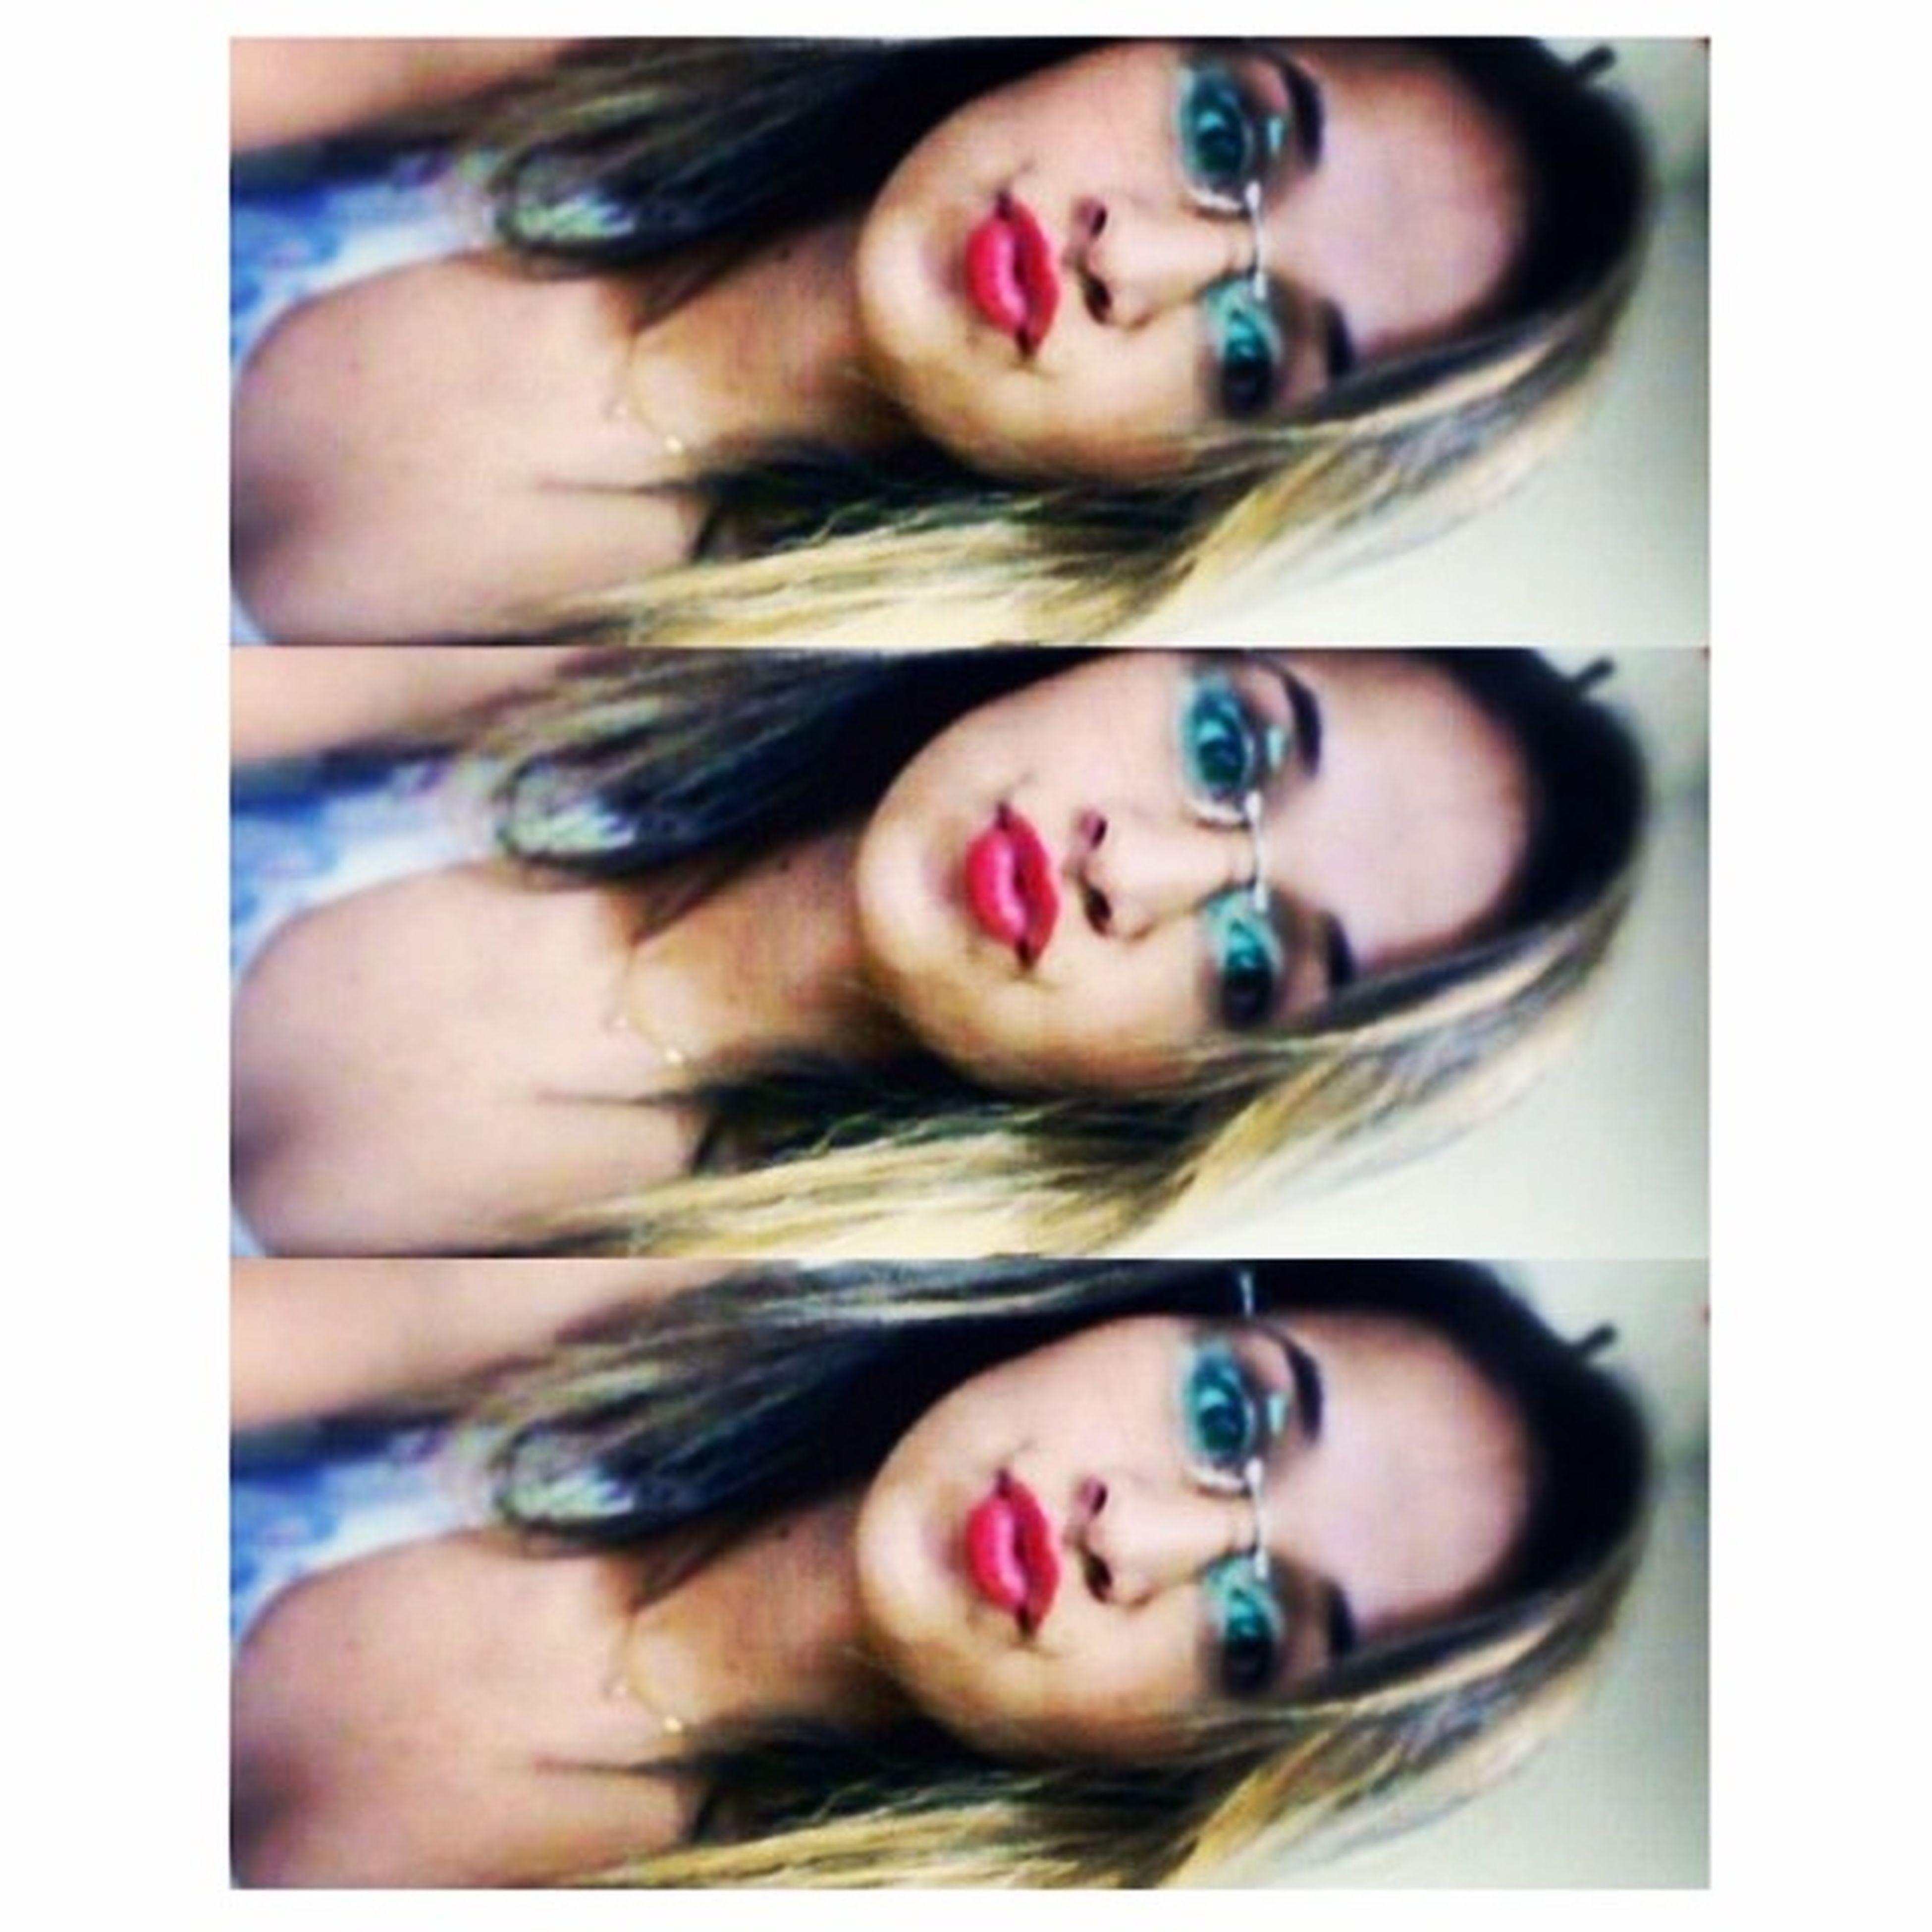 21w Euqueroessecabelodevolta Boatarde Photogrid TBT  selfie